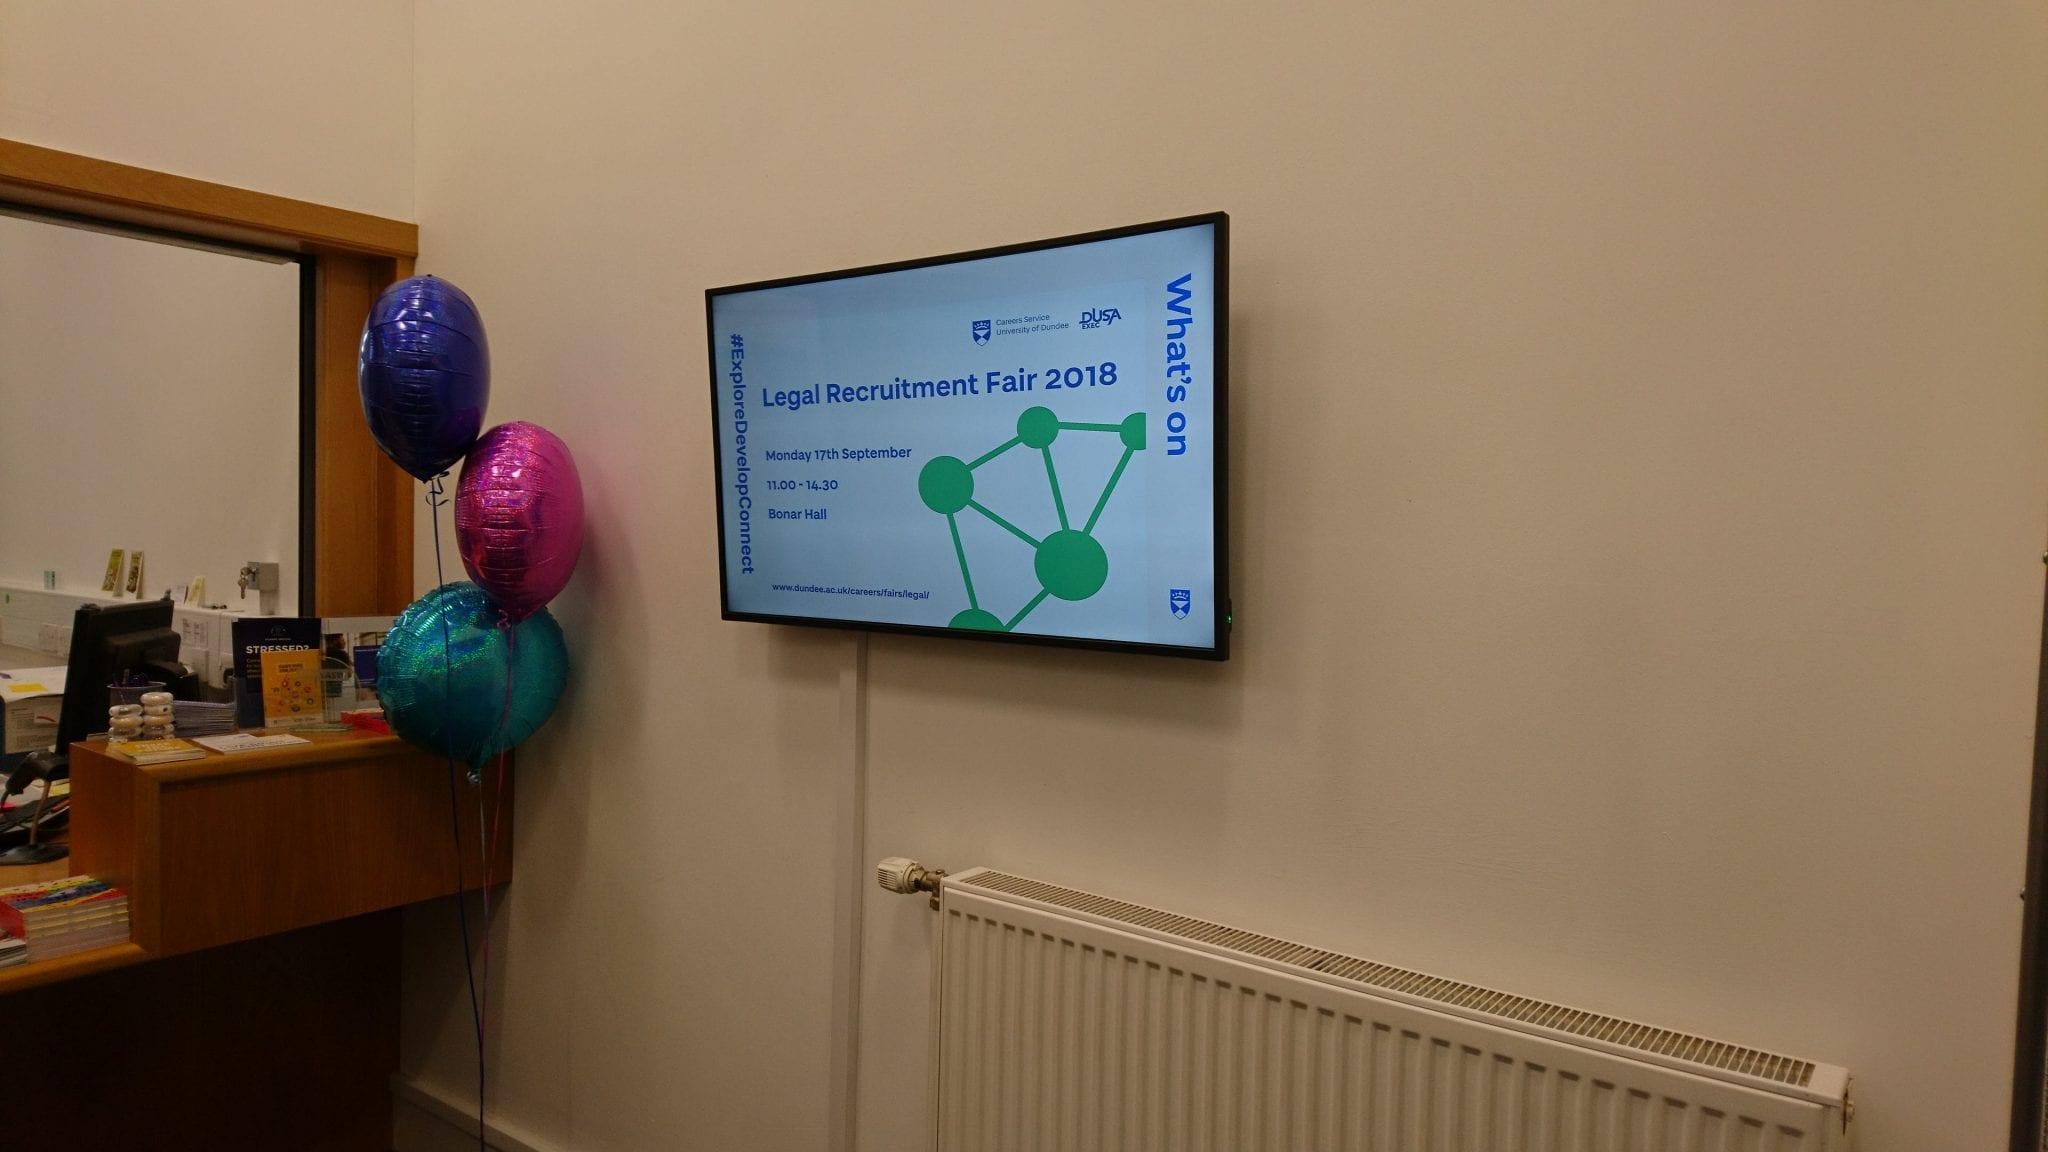 Digital signage at Education & Social Work reception